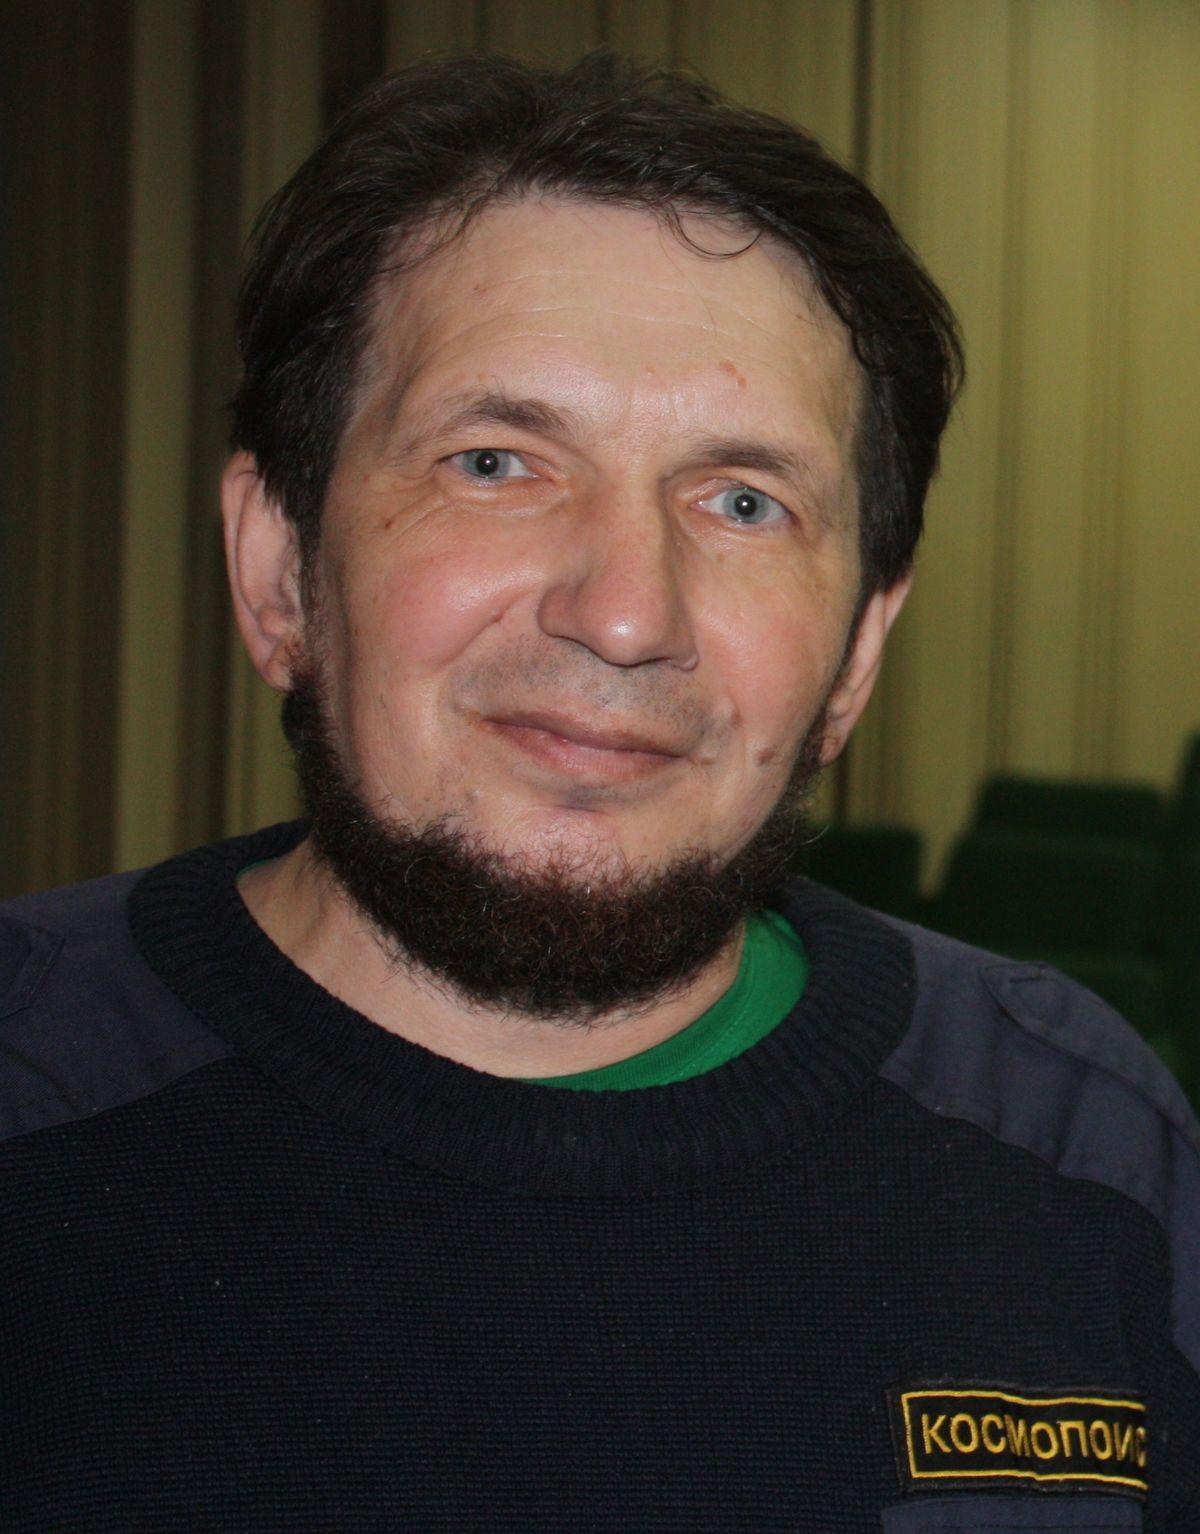 Chernobrov Vadim Aleksandrovich